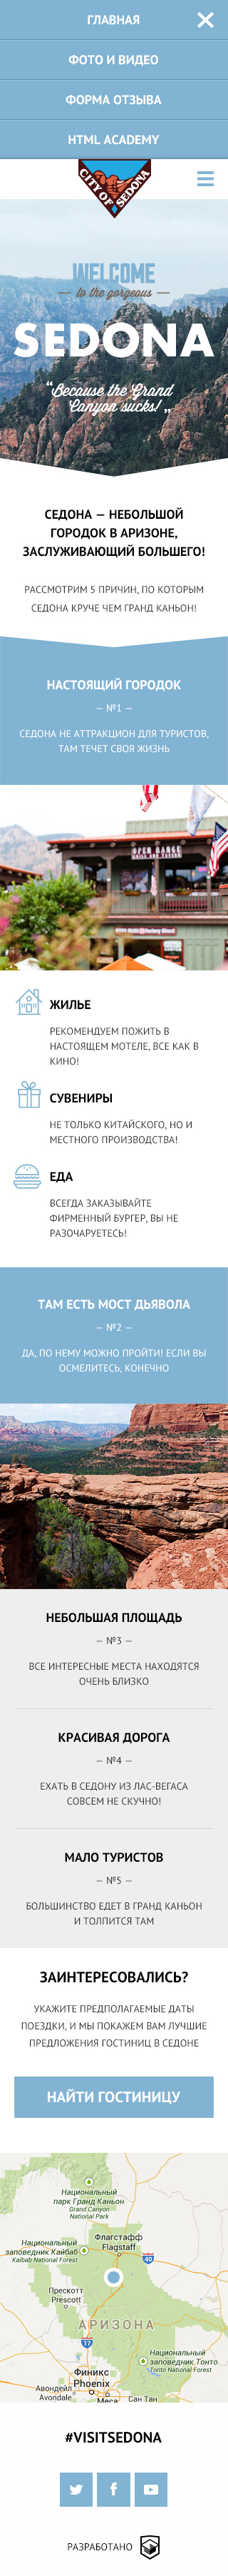 E4a8f4661e